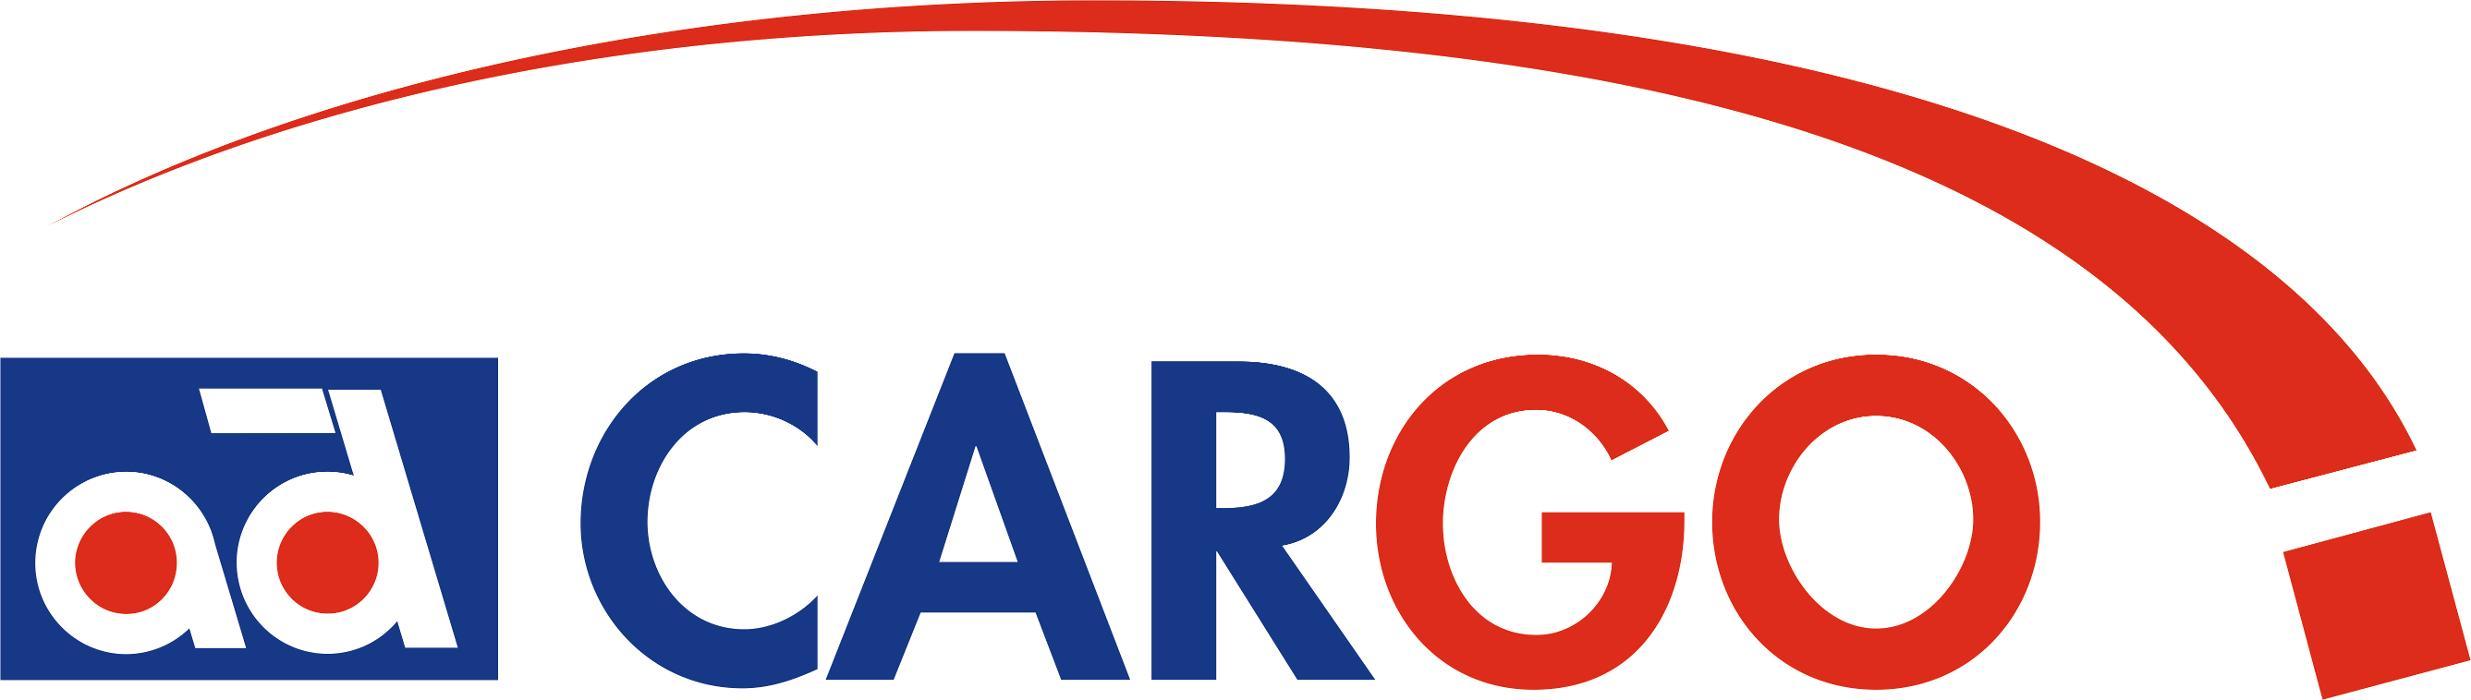 Bild zu ad-AUTOTEILE-CARGO GmbH & Co. KG in Castrop Rauxel